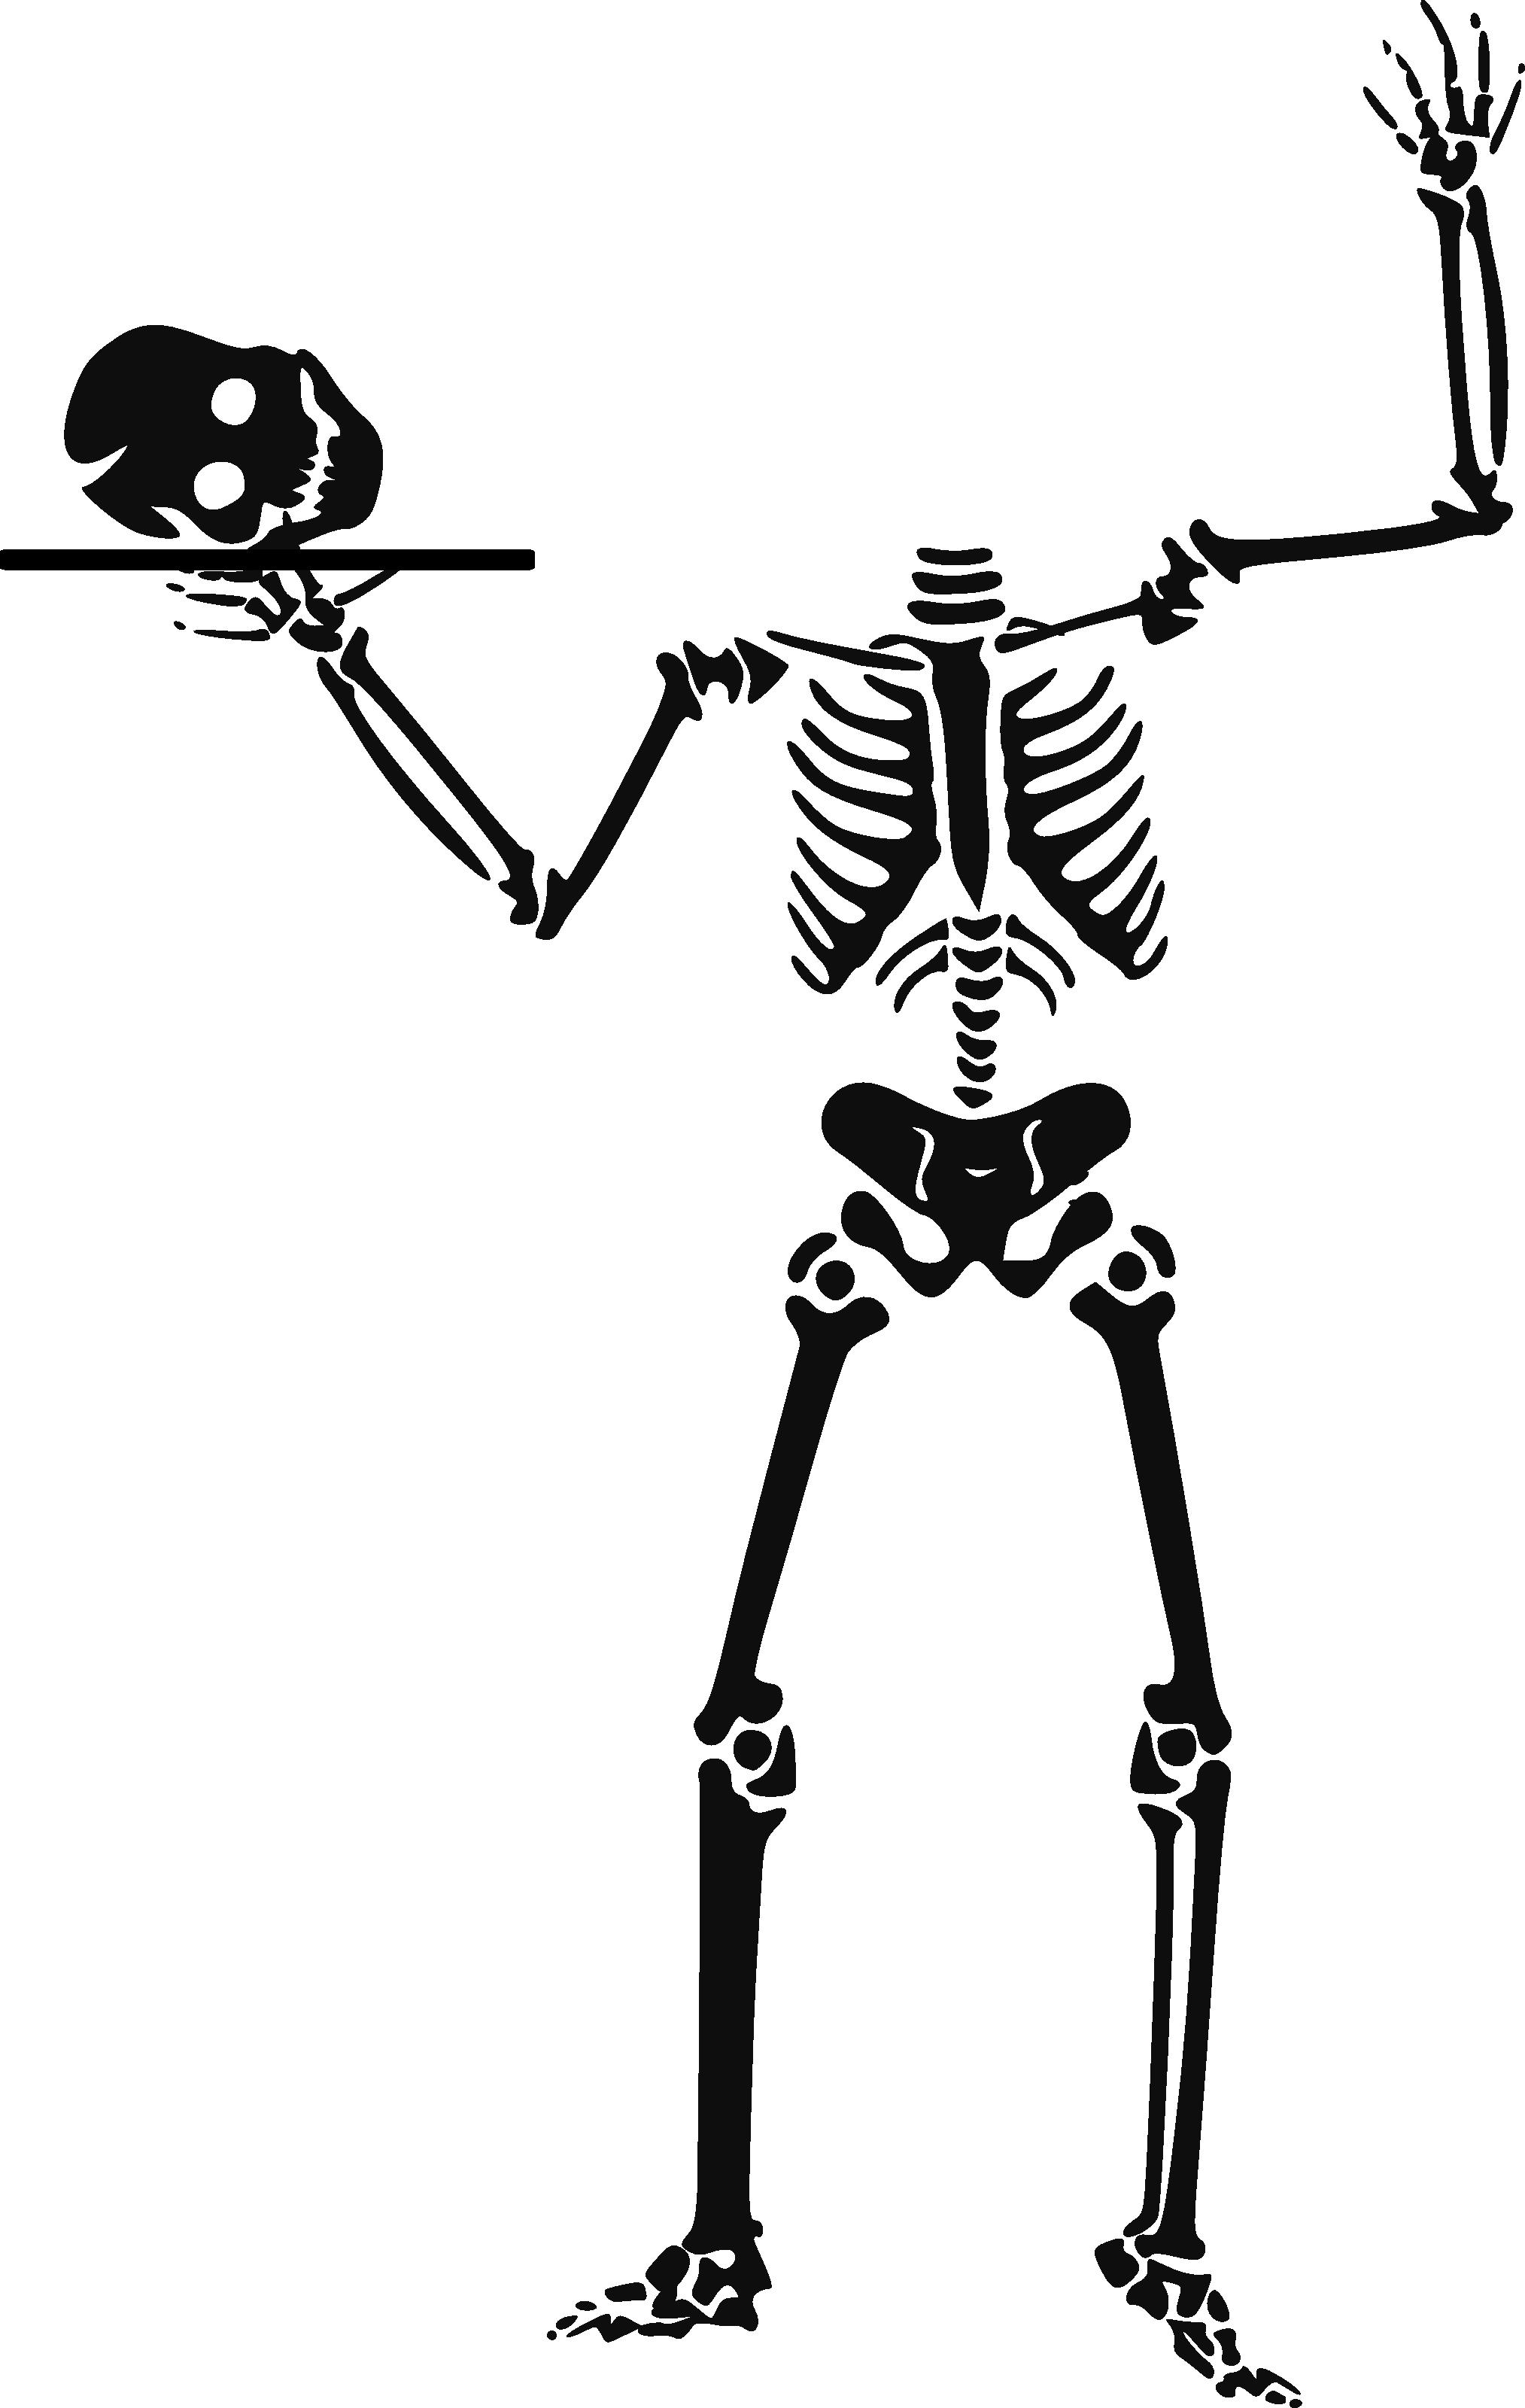 Free Human Skeleton Clipart, Download Free Clip Art, Free.